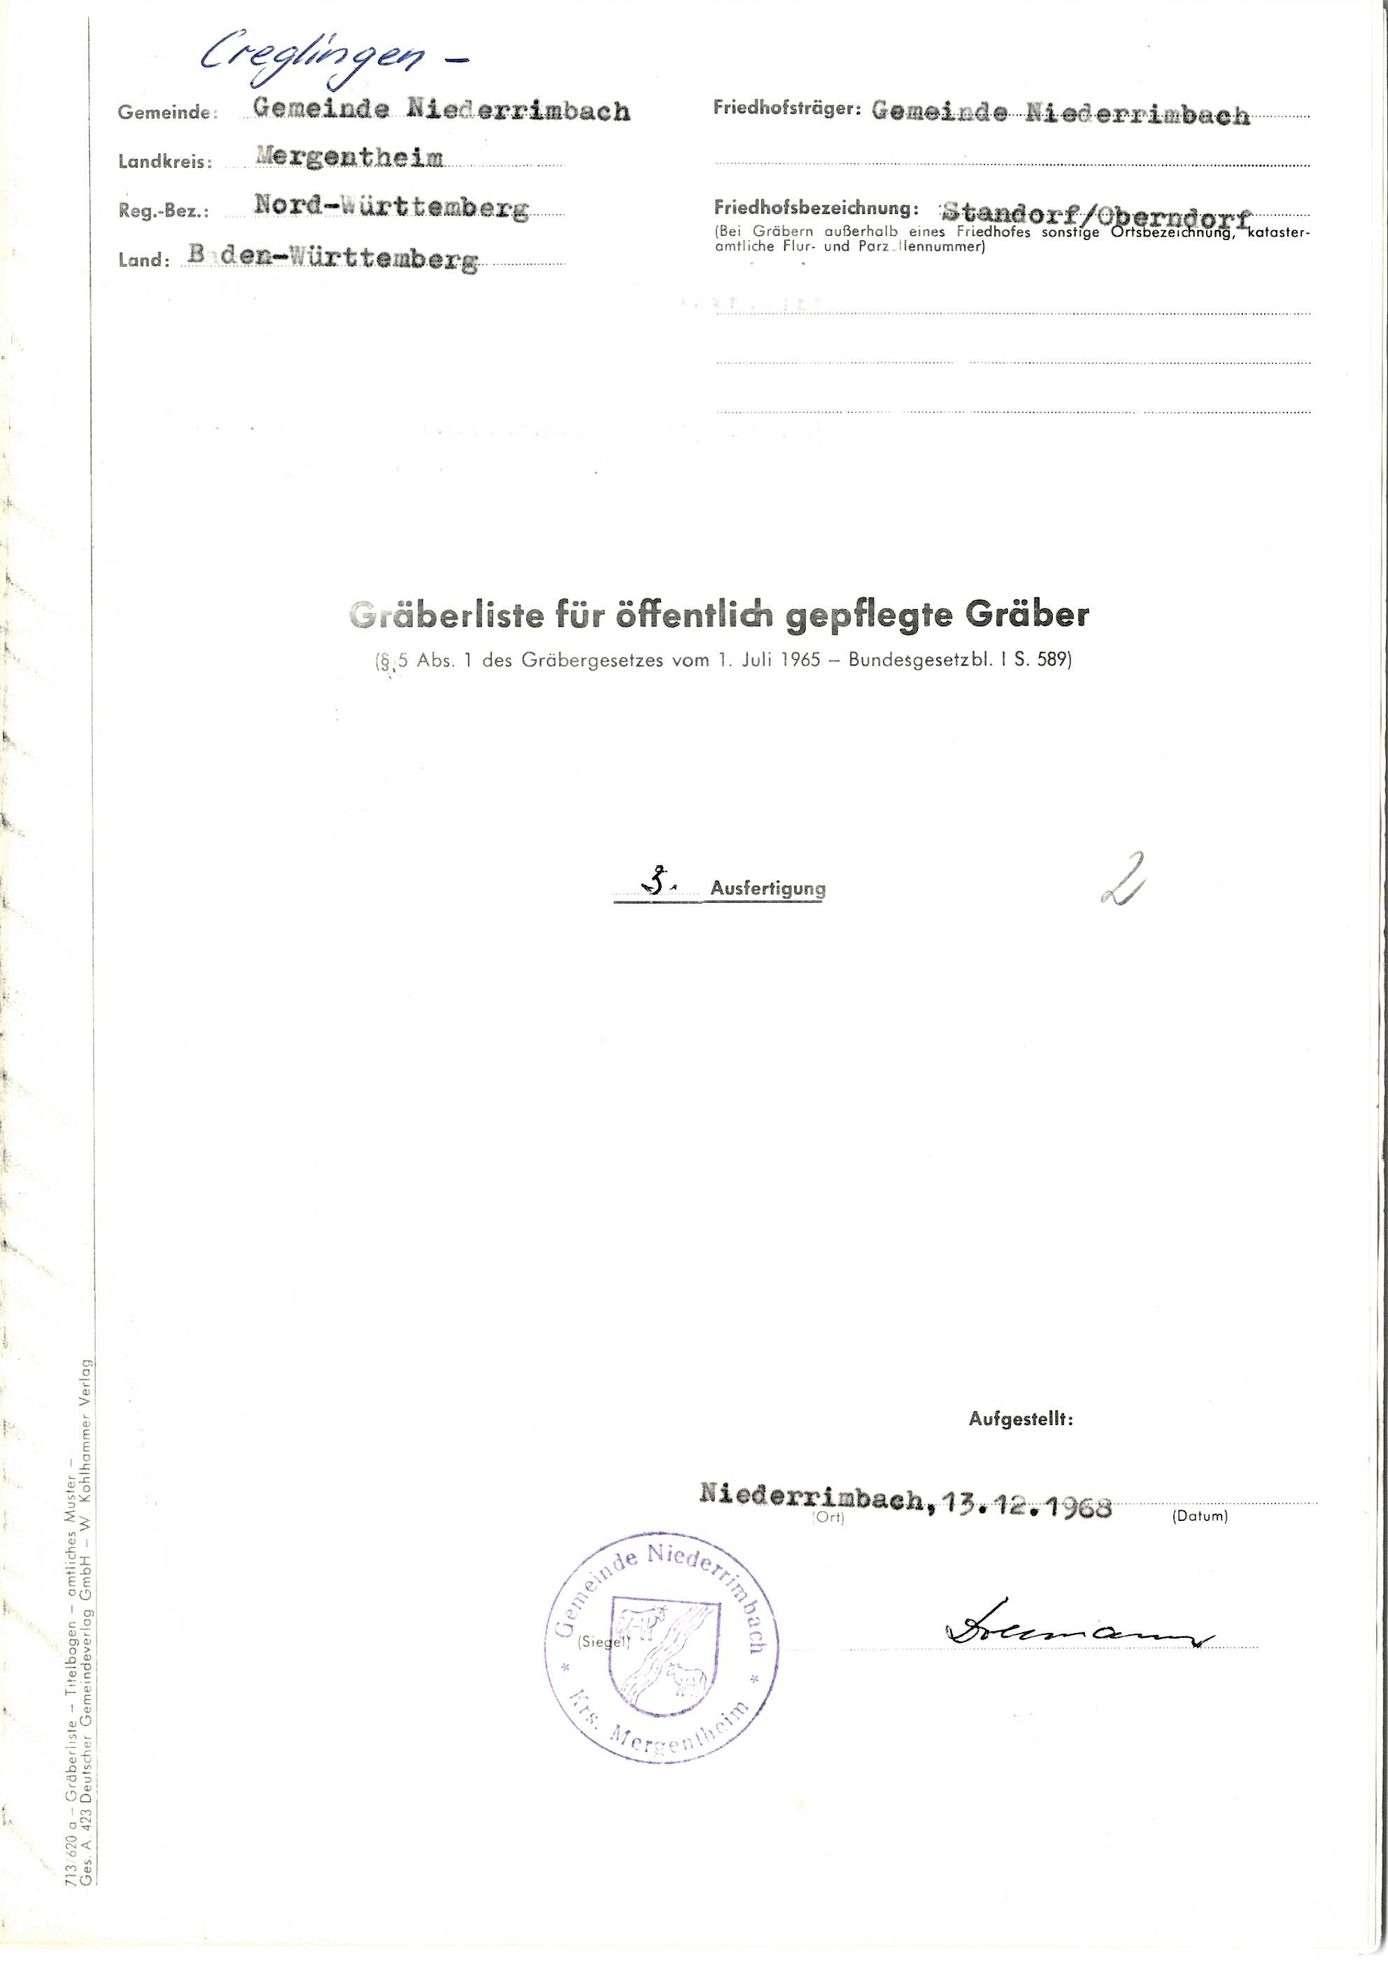 Niederrimbach-Standorf/ Oberndorf, Bild 1